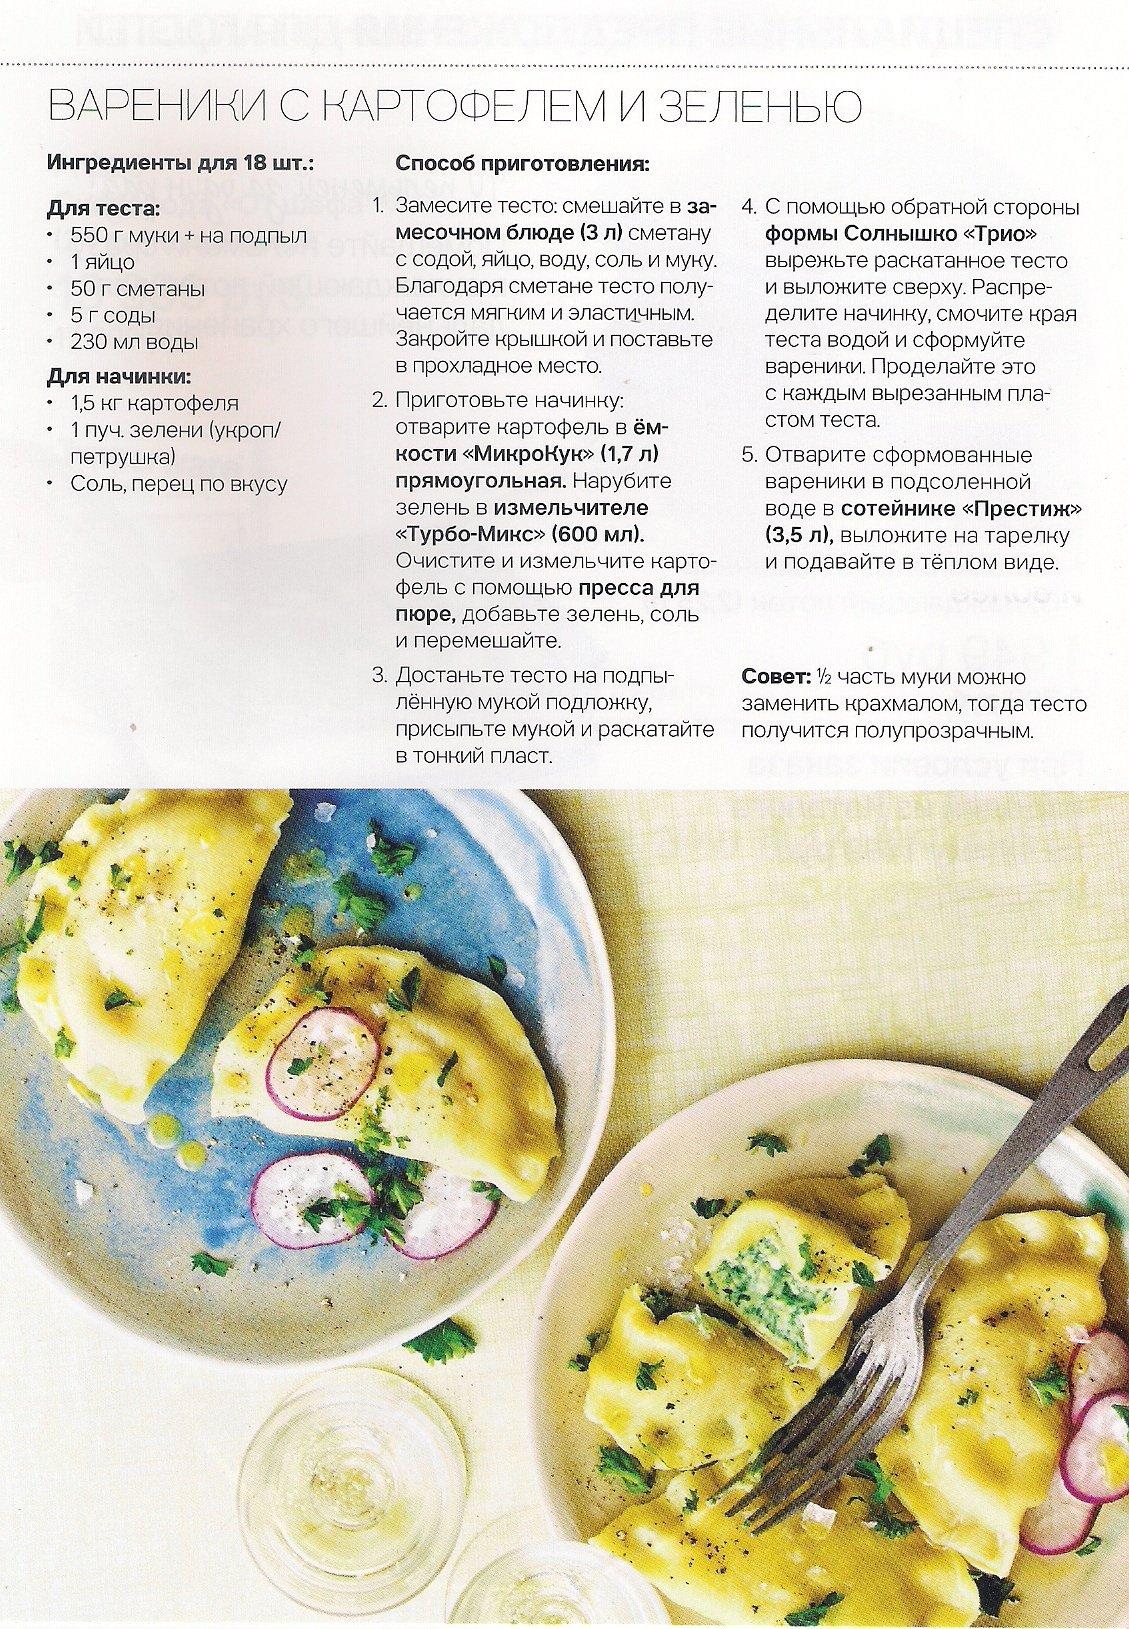 http://tupperware-online.ru/images/upload/19d.jpg